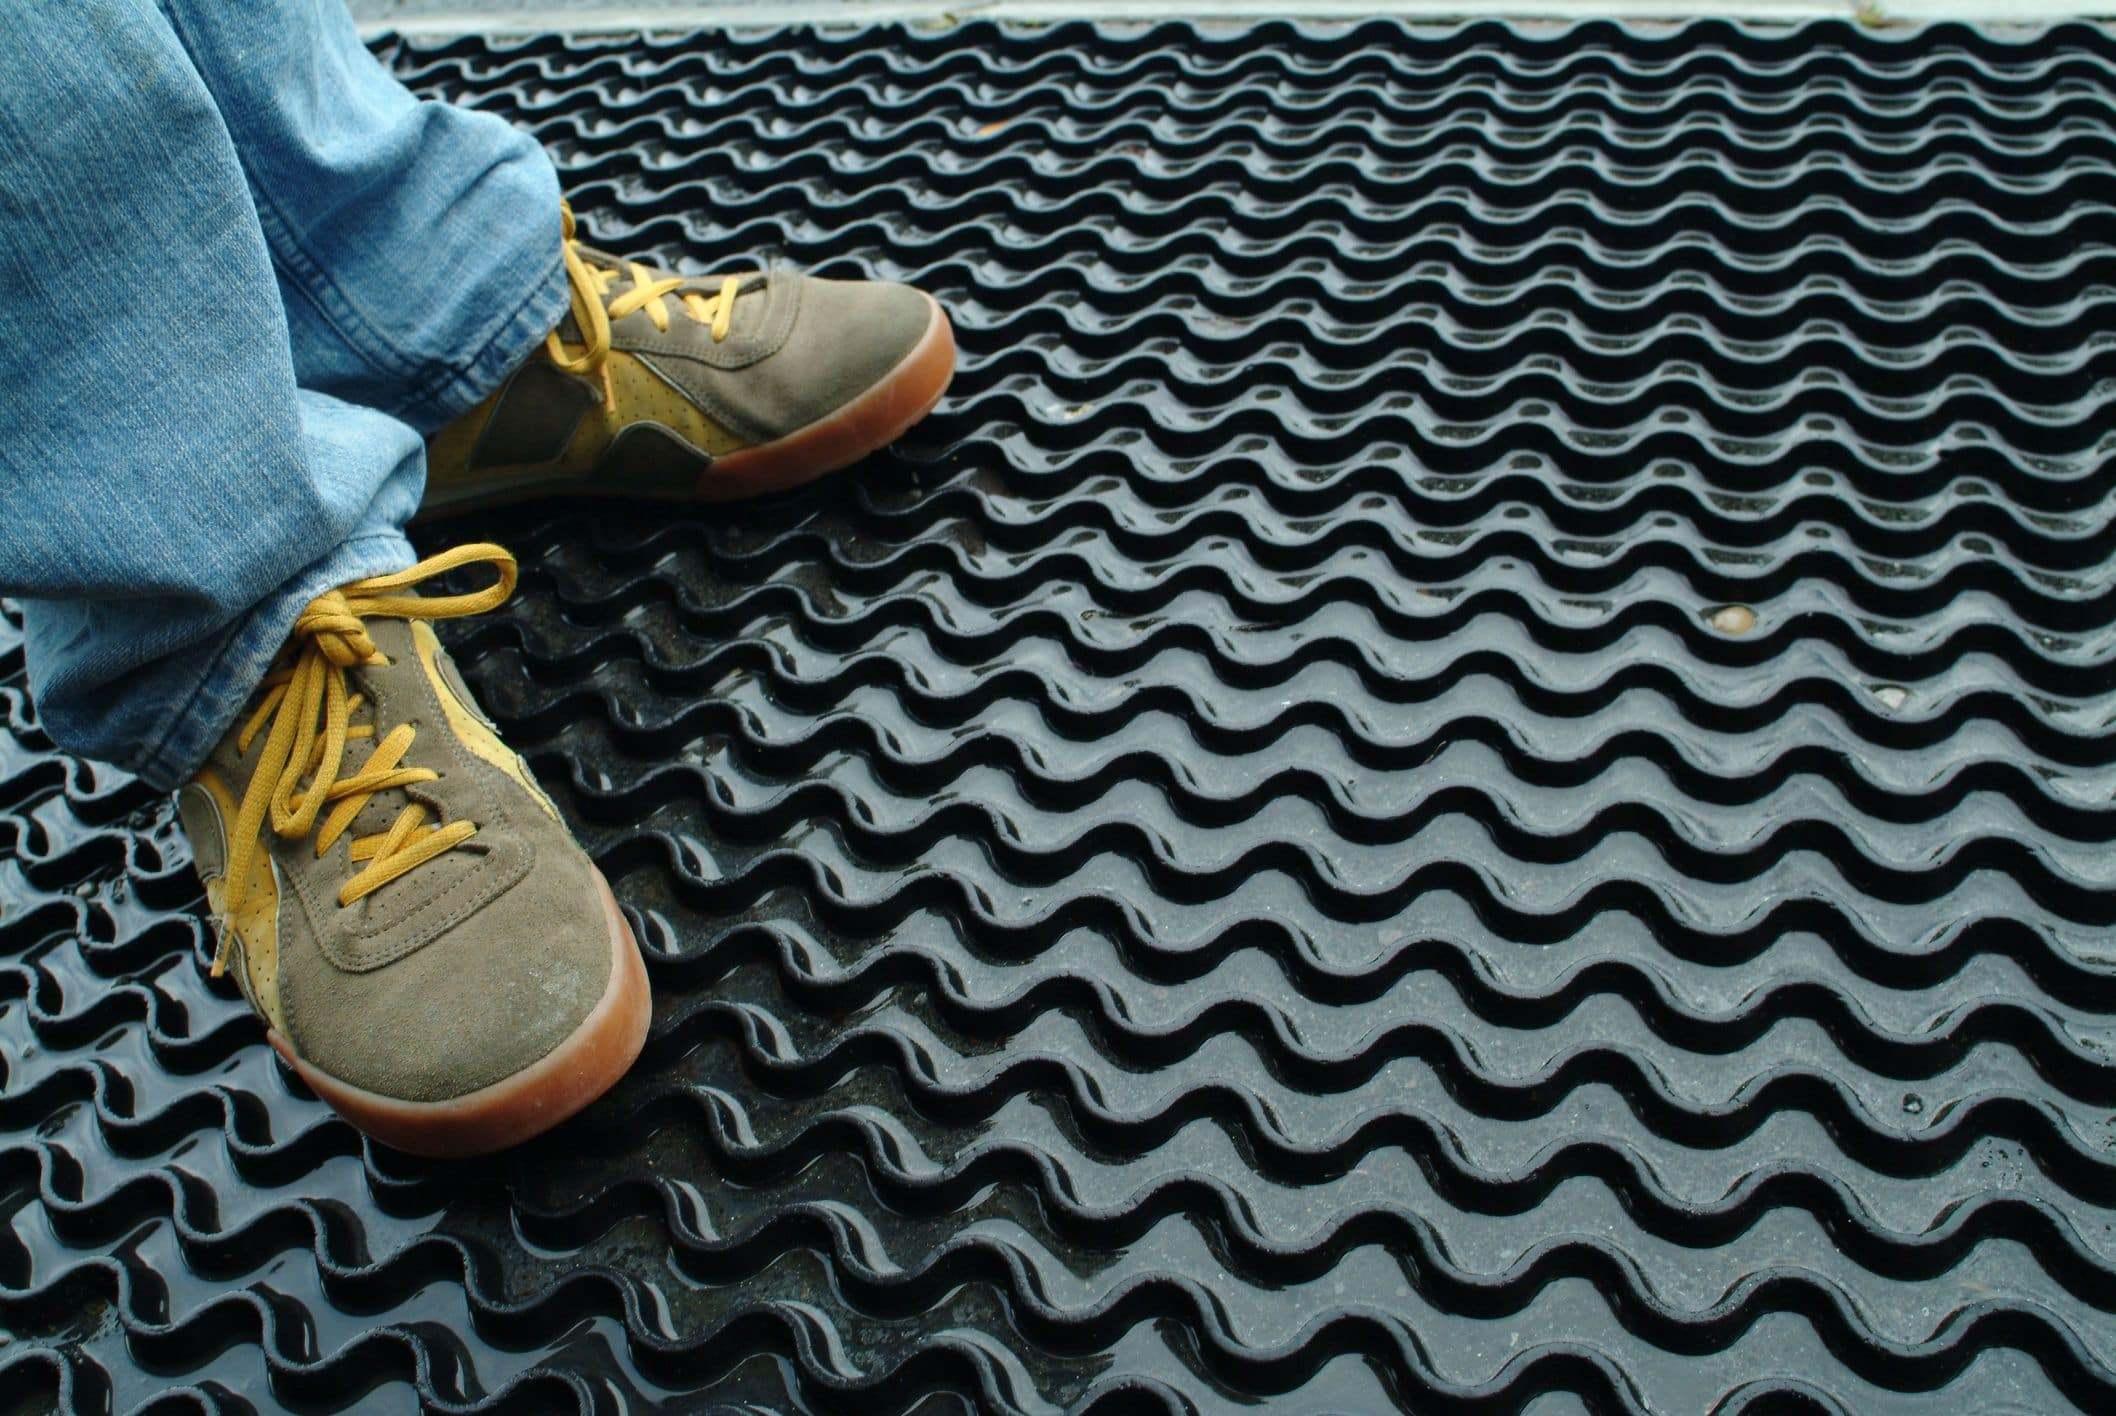 garage containment mat